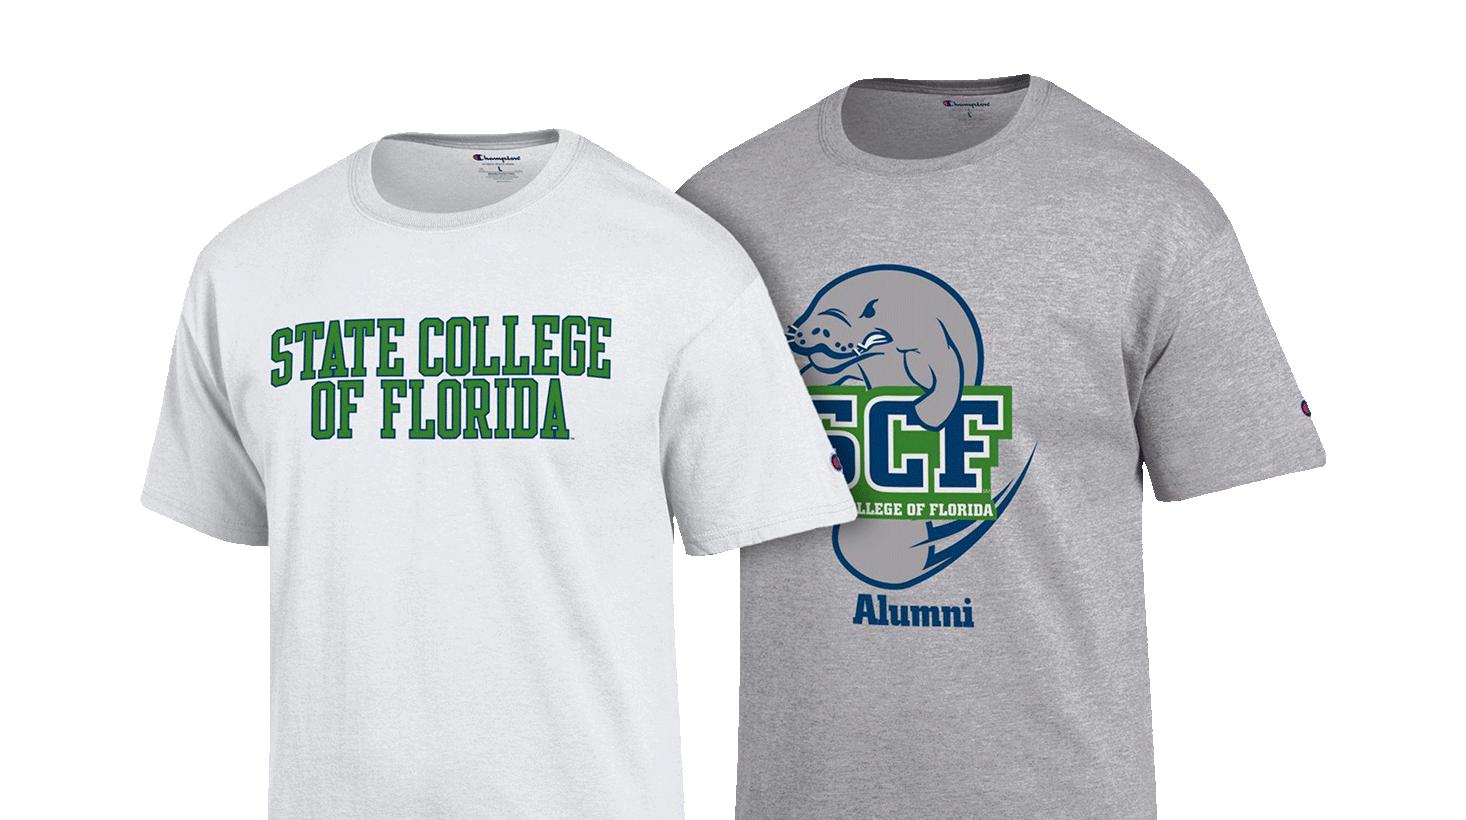 3b03fe25f4fb6 State College of Florida - Bradenton Apparel, Merchandise, & Gifts